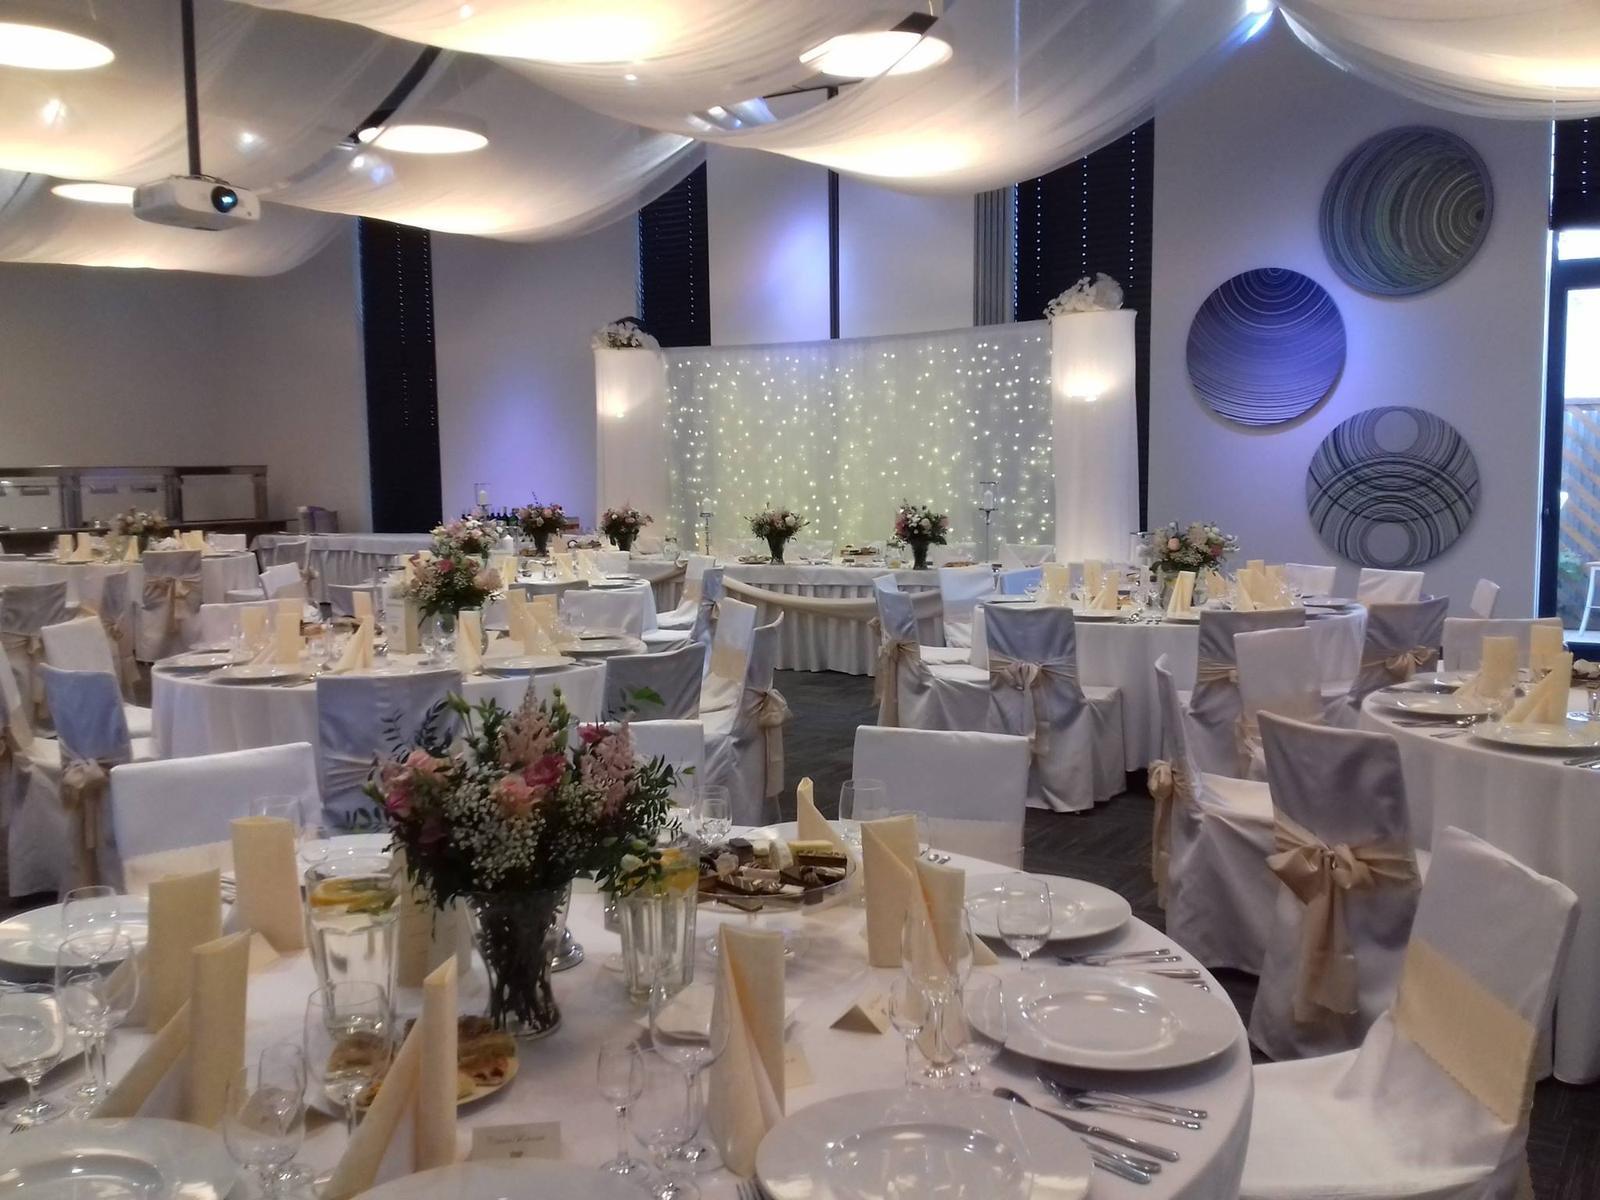 svadbaroca - Svadobná sála